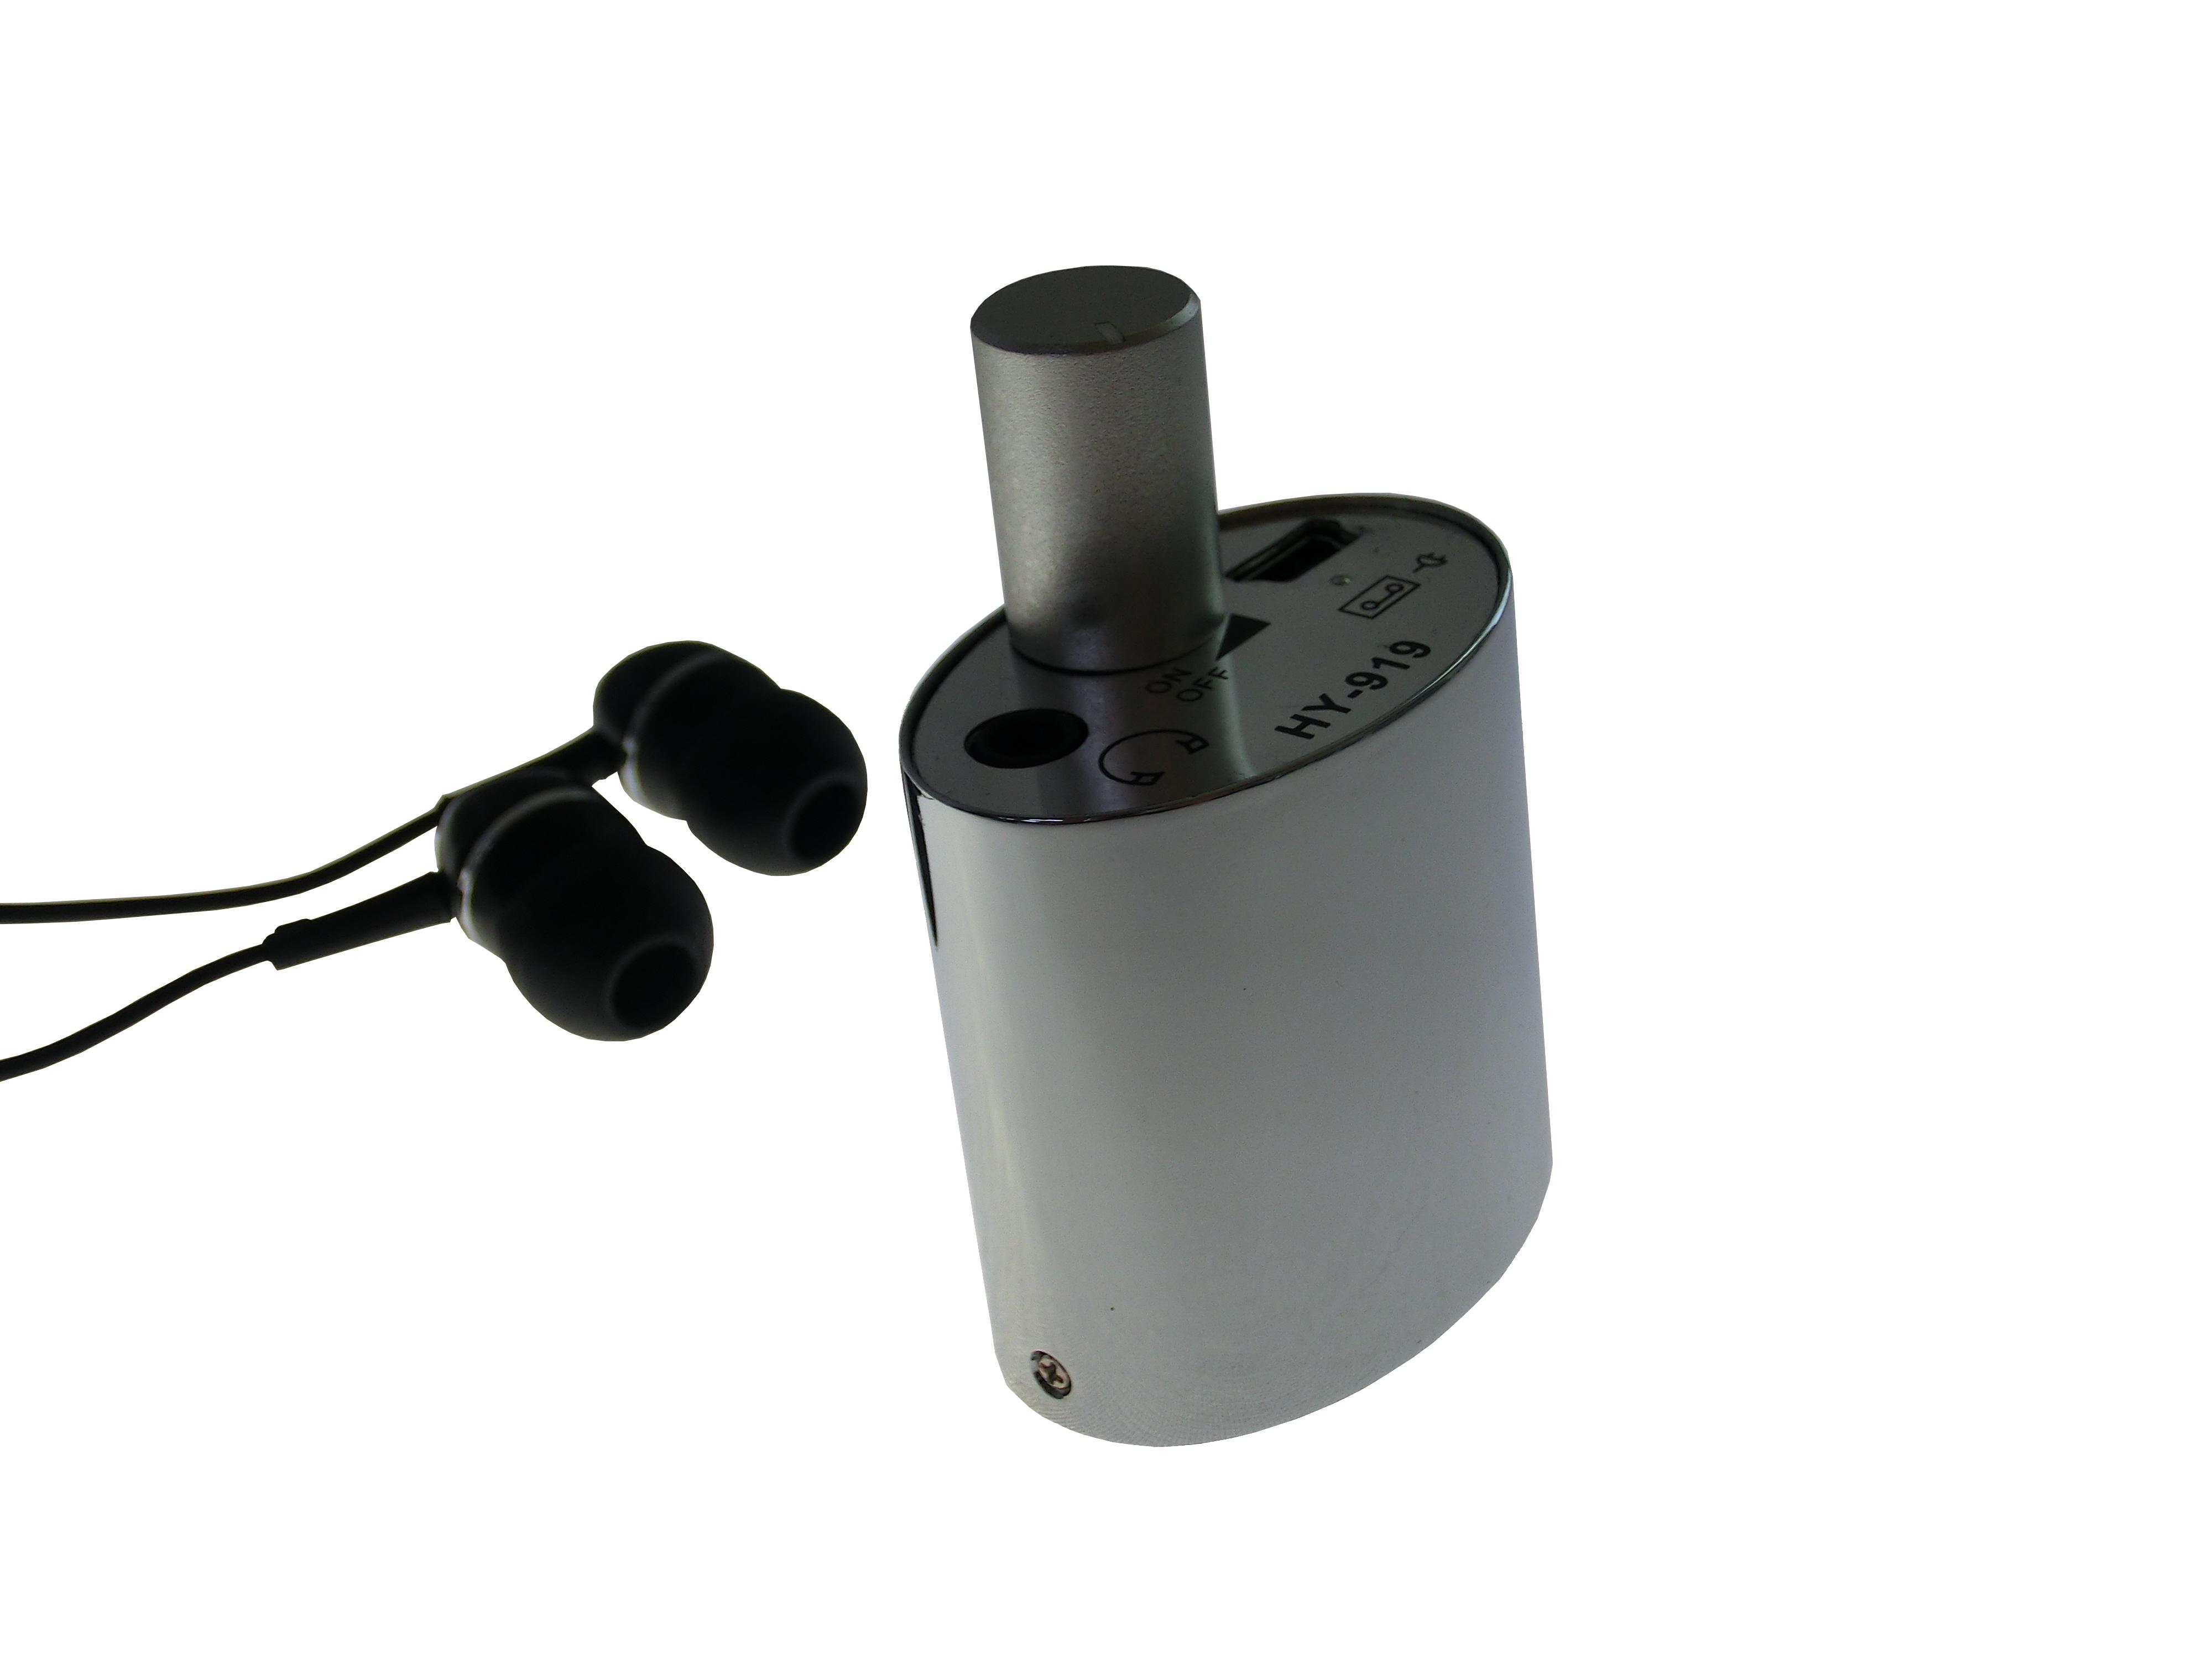 hochwertiges k rperschallmikrofon. Black Bedroom Furniture Sets. Home Design Ideas